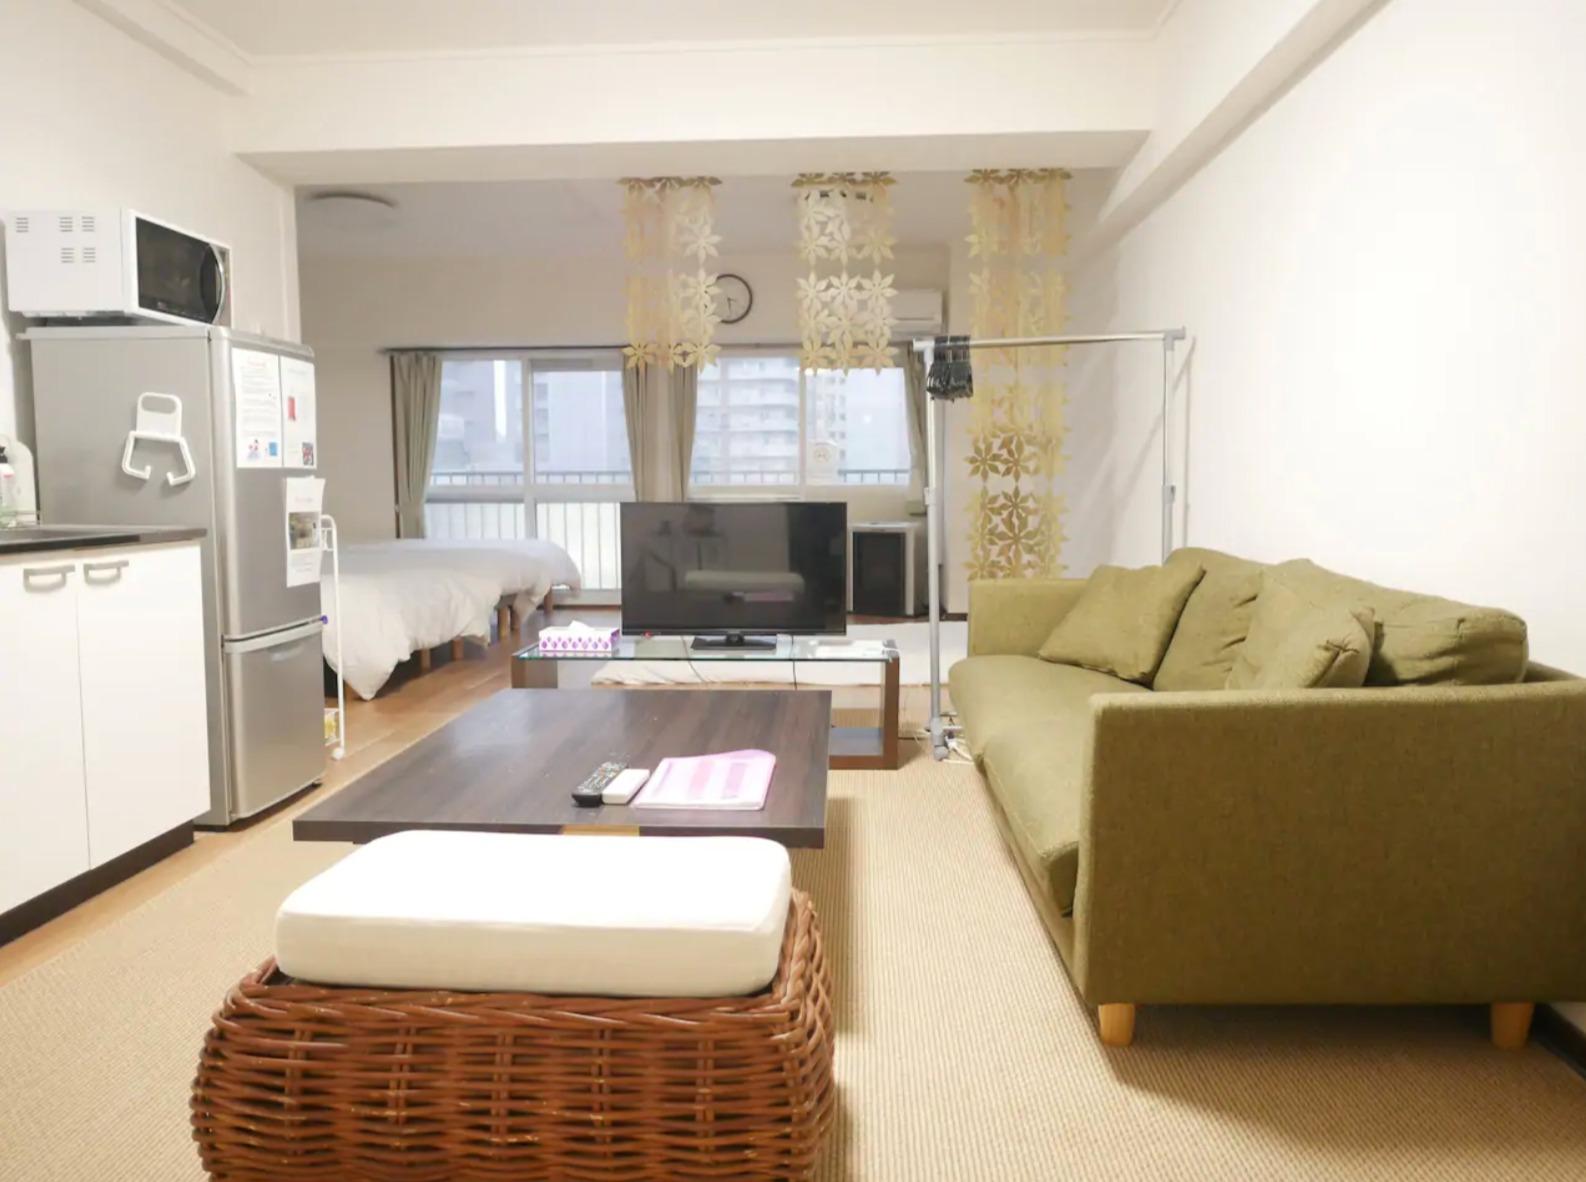 Cozy and comfortable apartment. ゆっくりくつろげるのが魅力☆